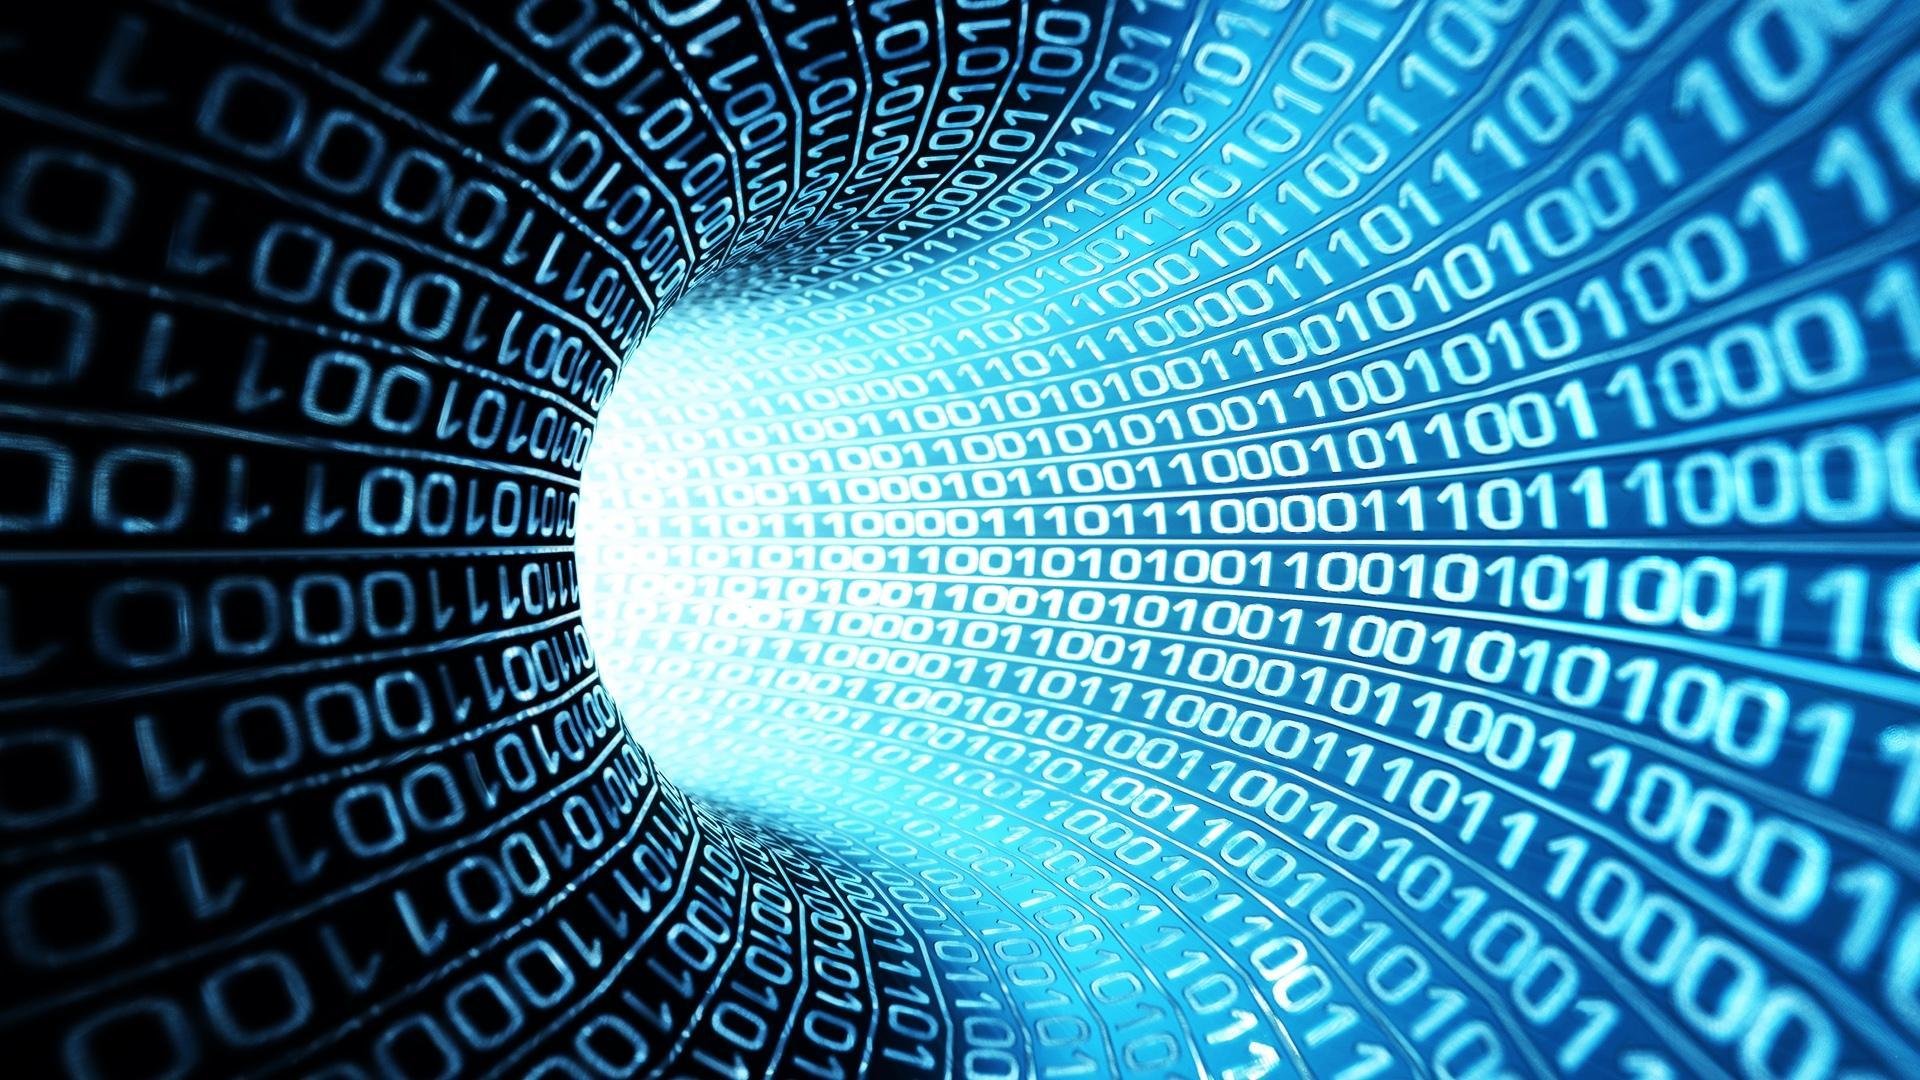 Binary Number Tunnel 1080p Hd Wallpaper Perustat Analytics